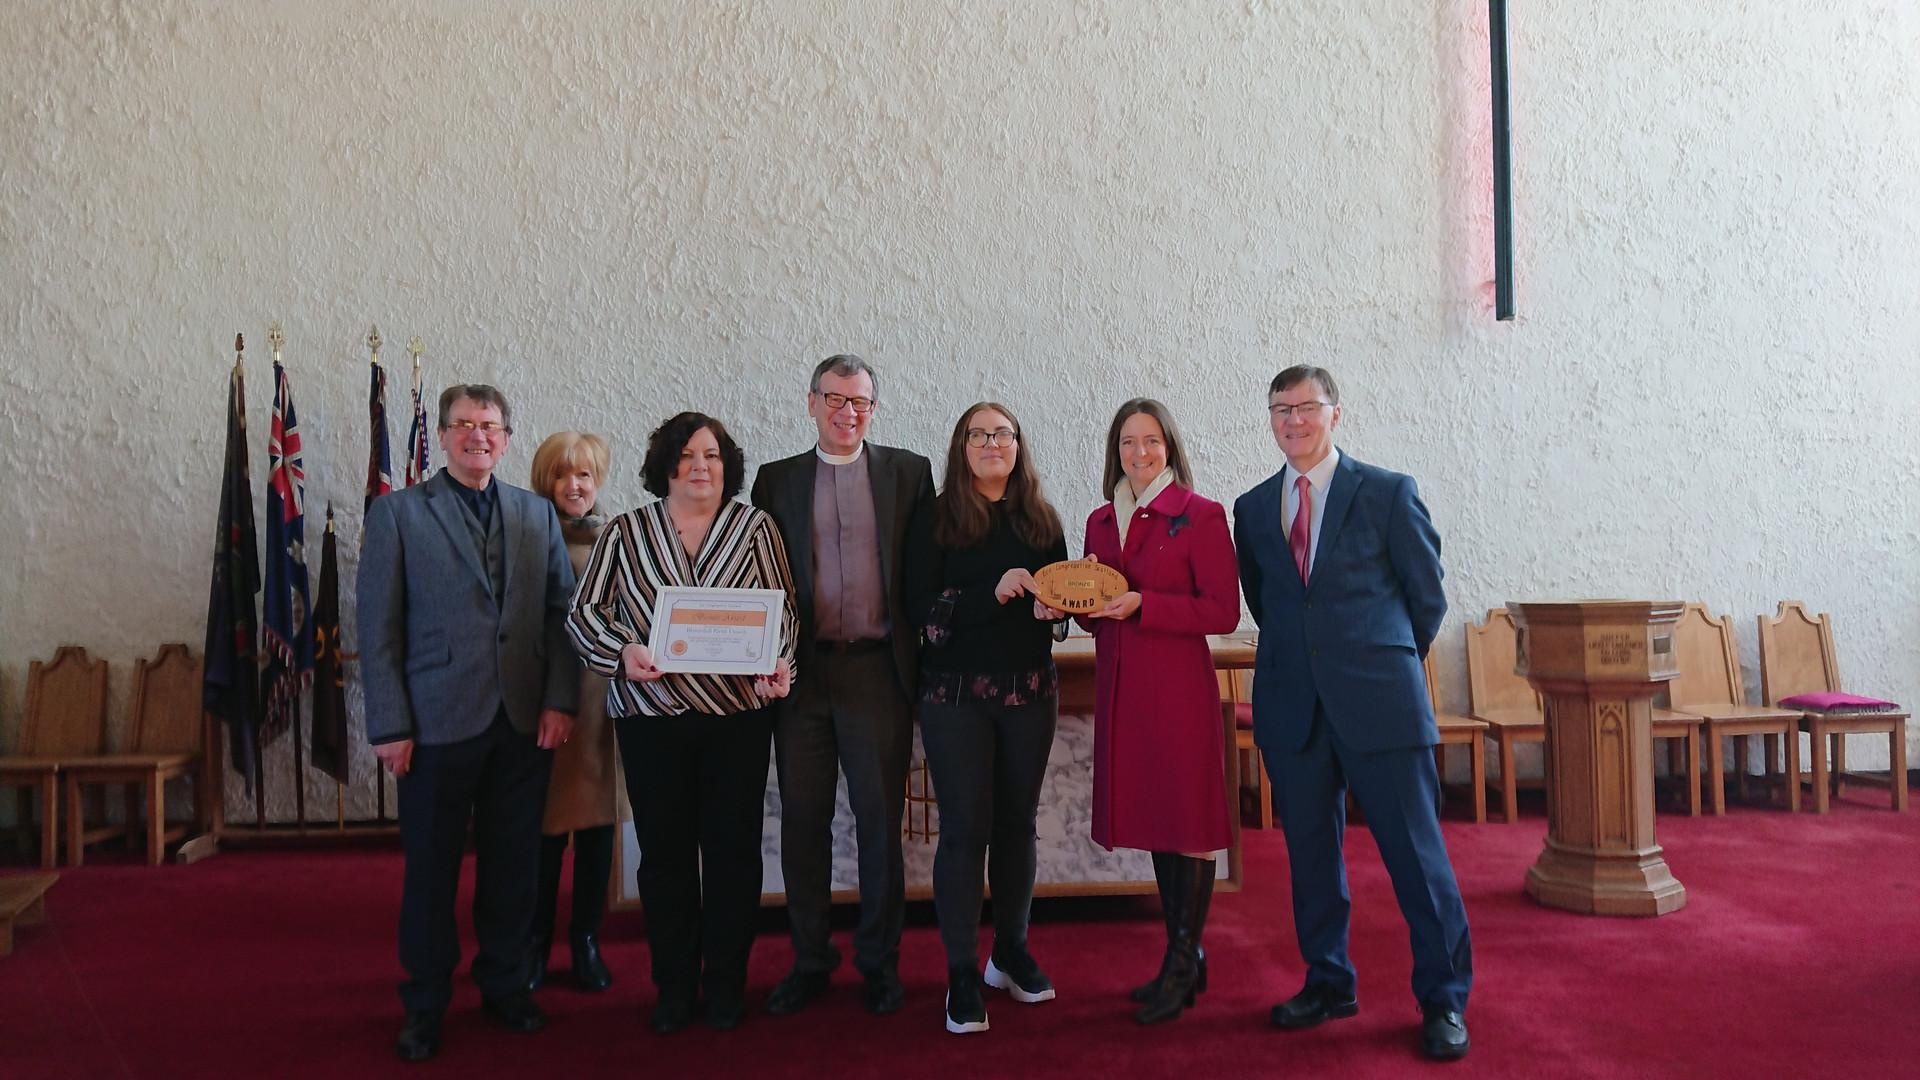 Presentation of Eco Congregation award by Carol Monaghan MP, Feb 2020:  L to R Frank and Isla Dick (Eco-Congregation Scotland), Lesleyanne Deans, Rev Melvyn Wood, Lucy Deans, Carol Monaghan, John Thomson (Session Clerk).